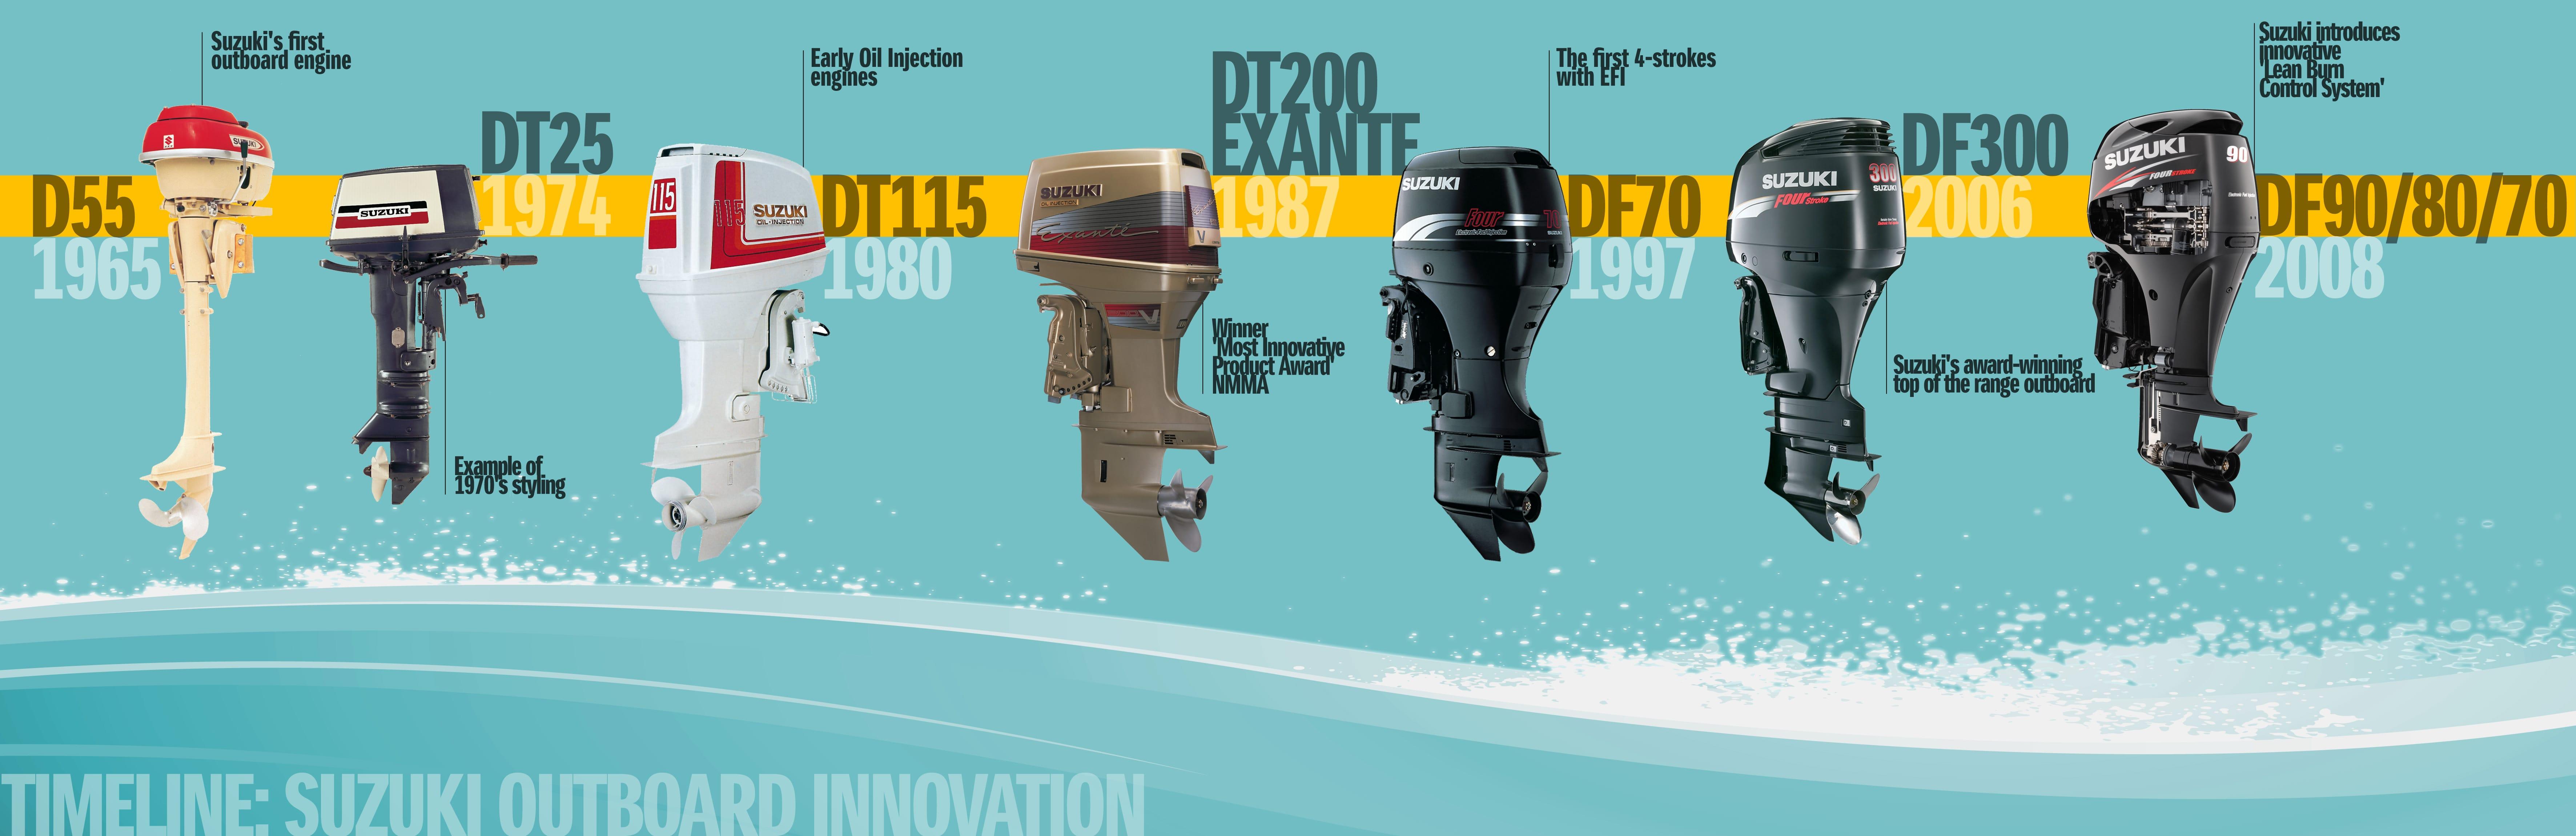 suzuki celebrates 100 years of innovation | suzuki marine europe